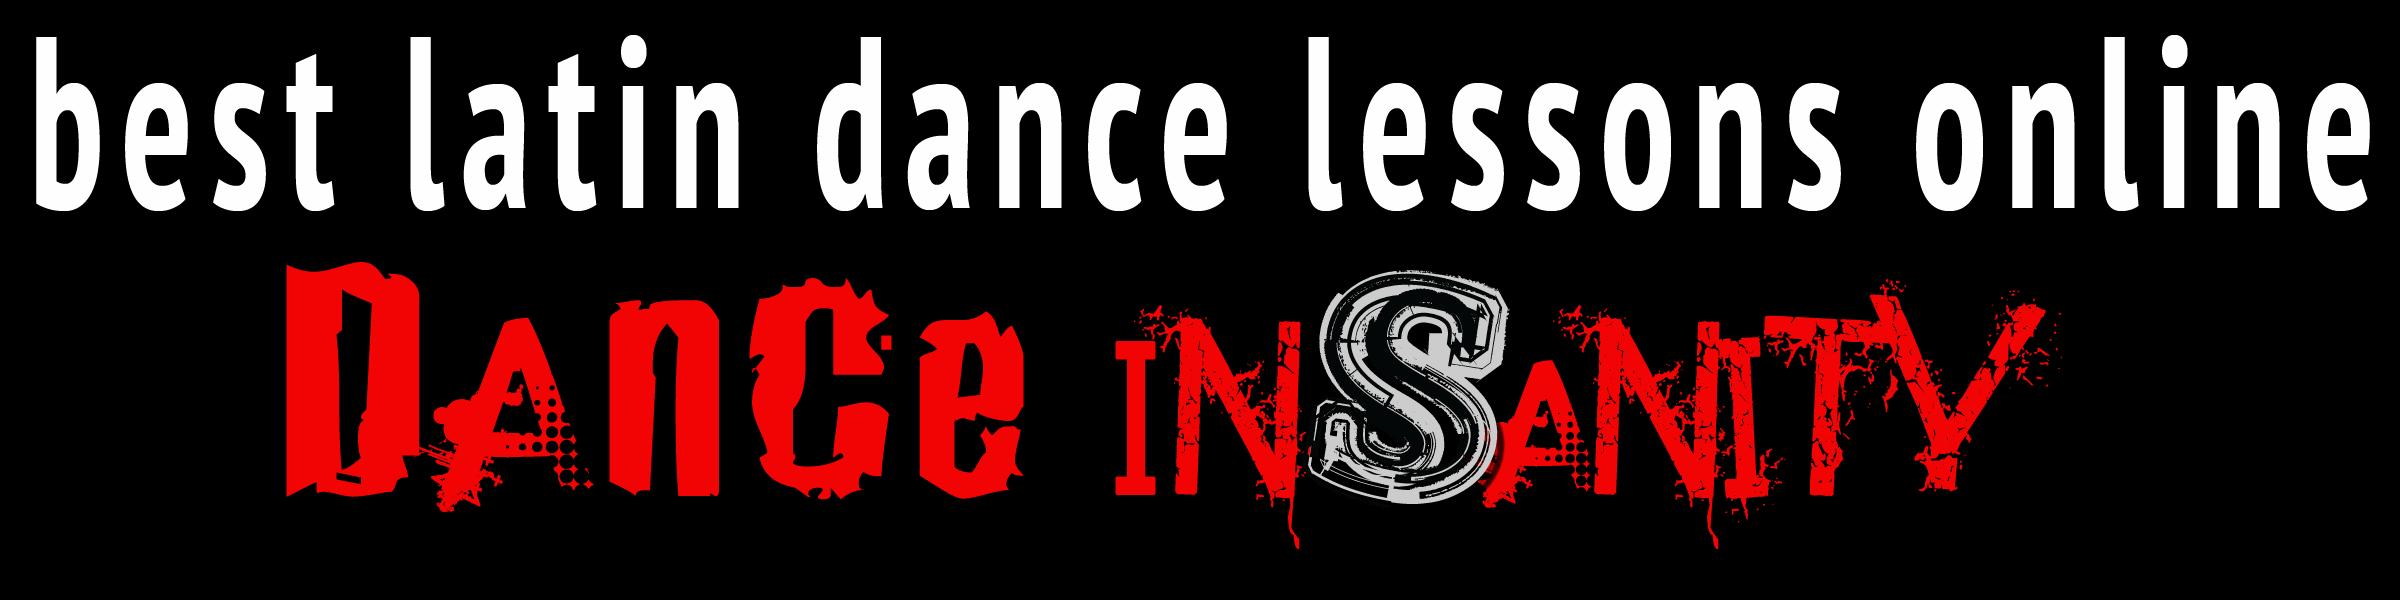 Dance Insanity